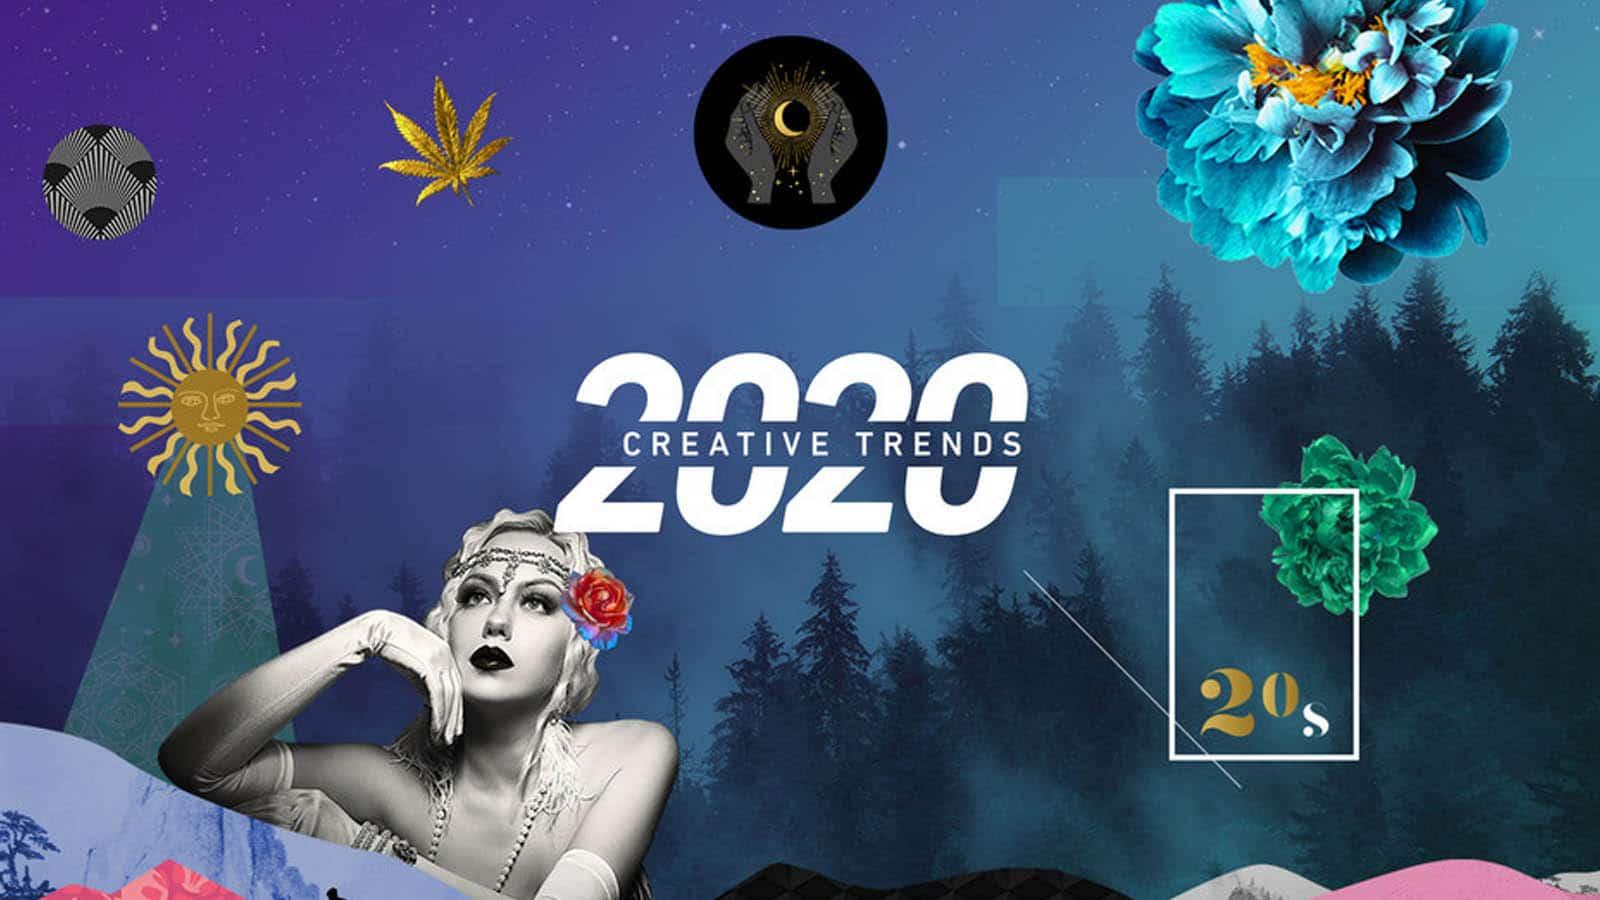 shutterstock creative trends report for 2020